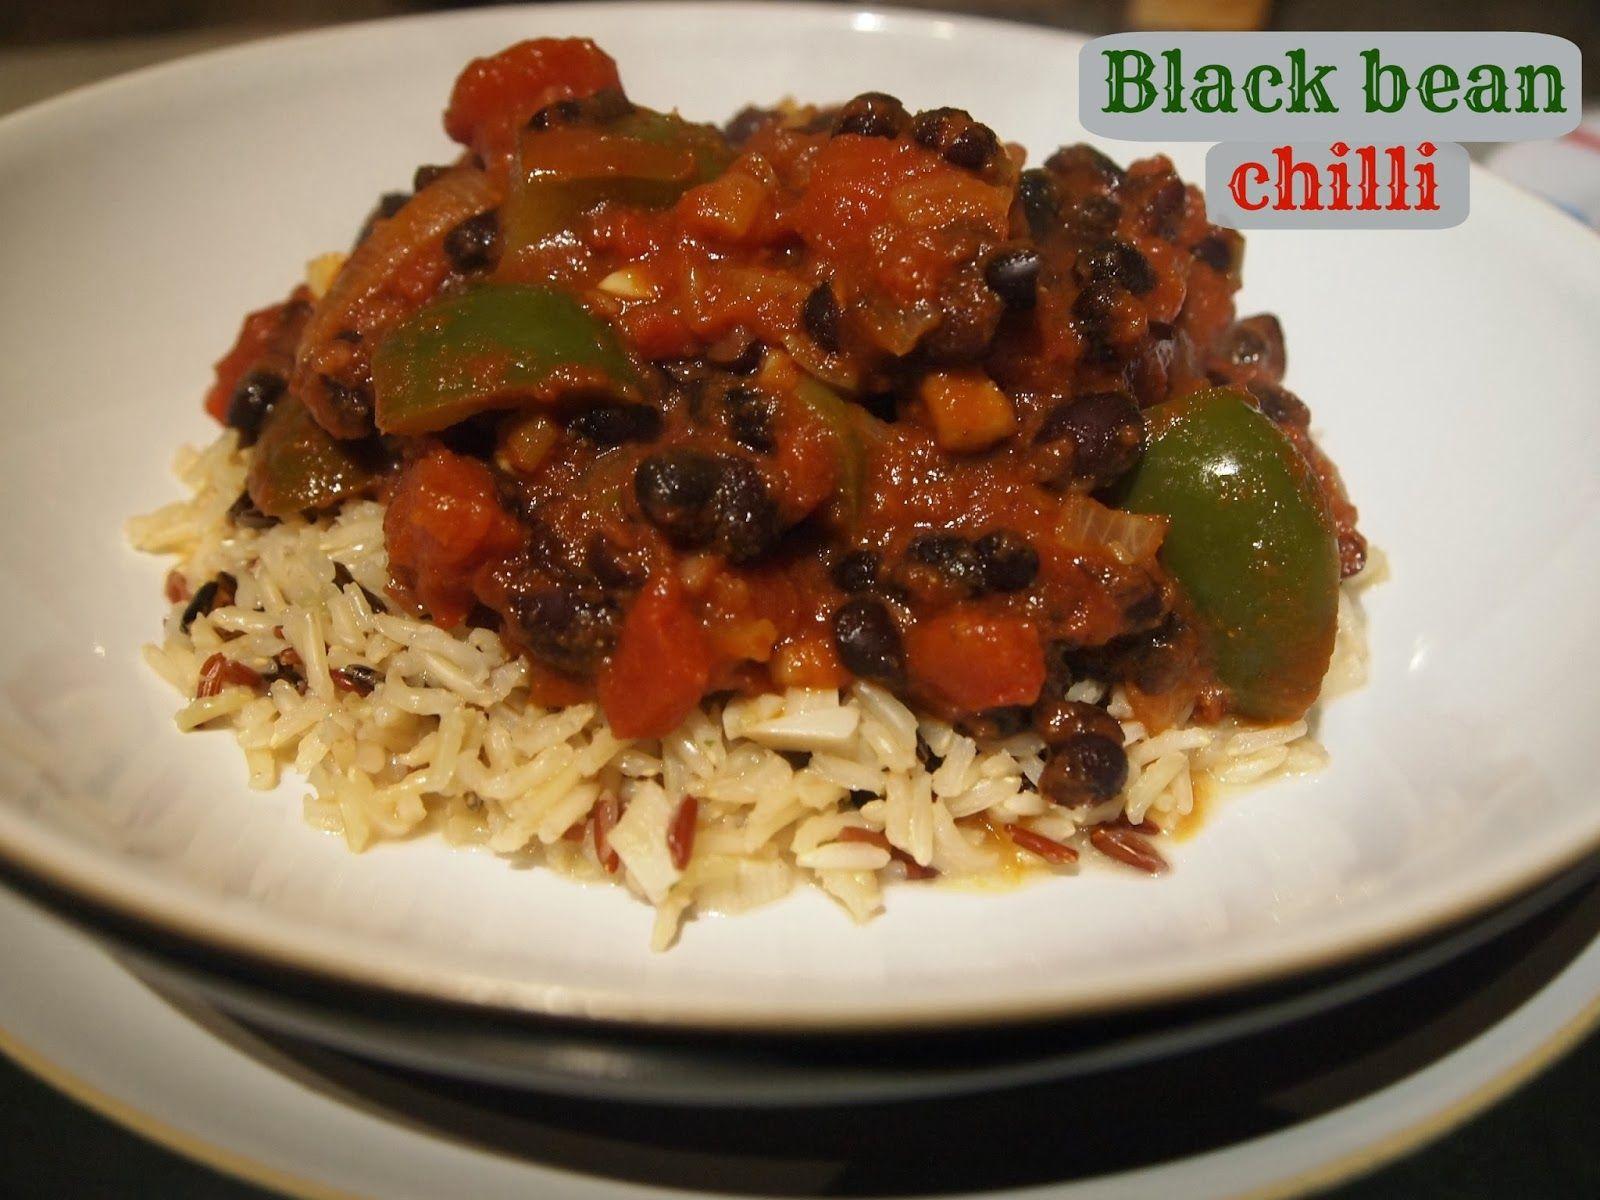 Black bean chilli 4 propoints per serving.  #weightwatchers